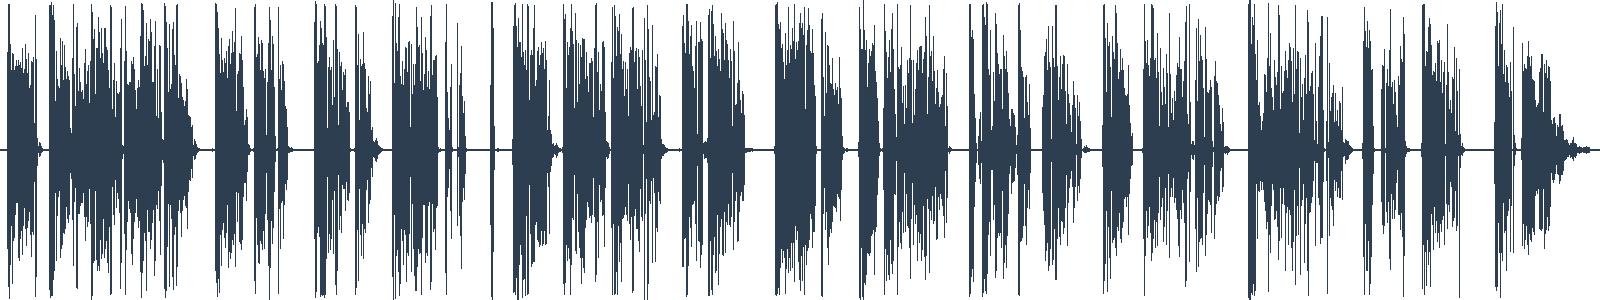 Hadrový panák - ukázka z audioknihy waveform